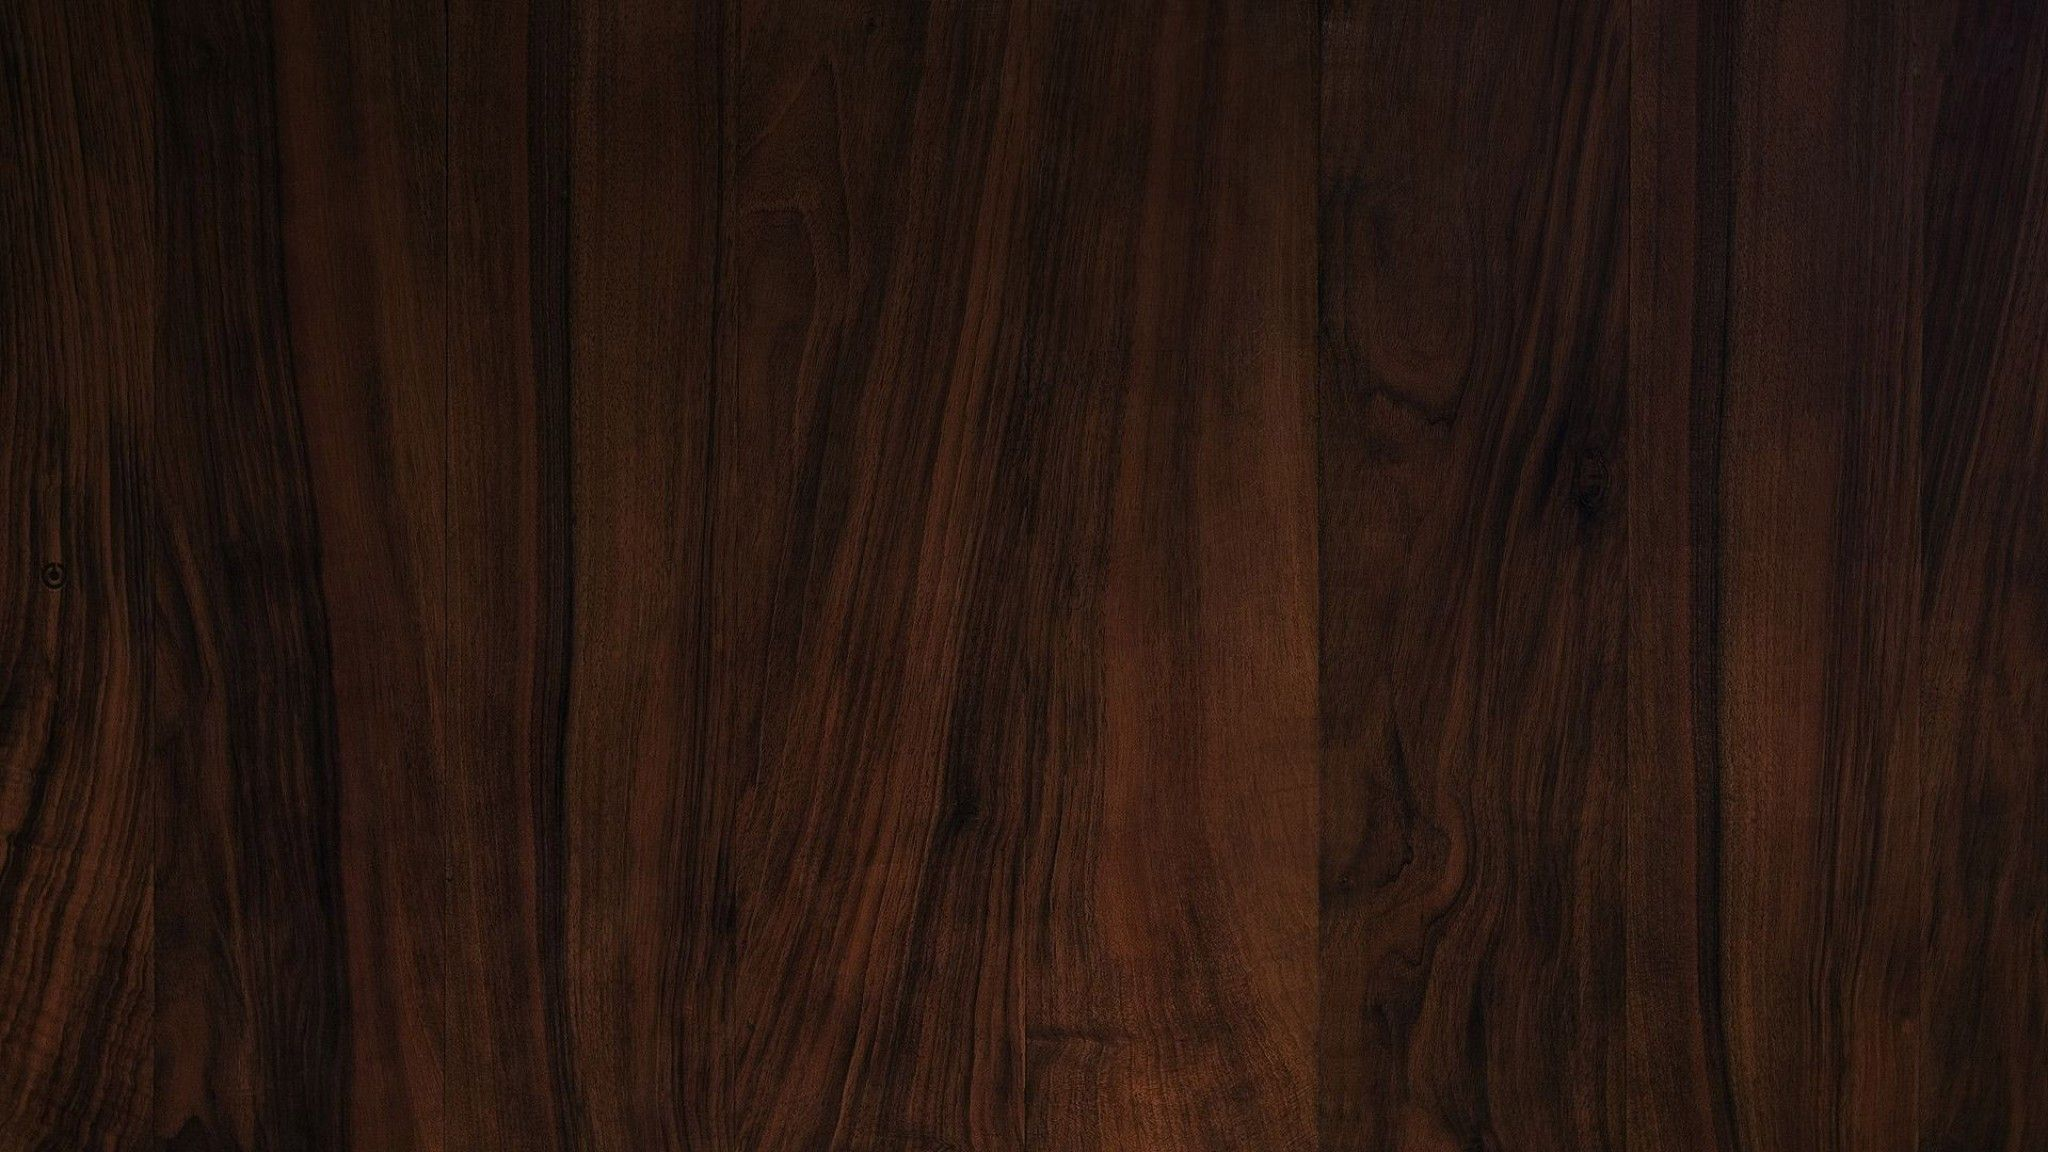 Enjoyable Jarrah Texture Dark Wood Floor For Decorate Home